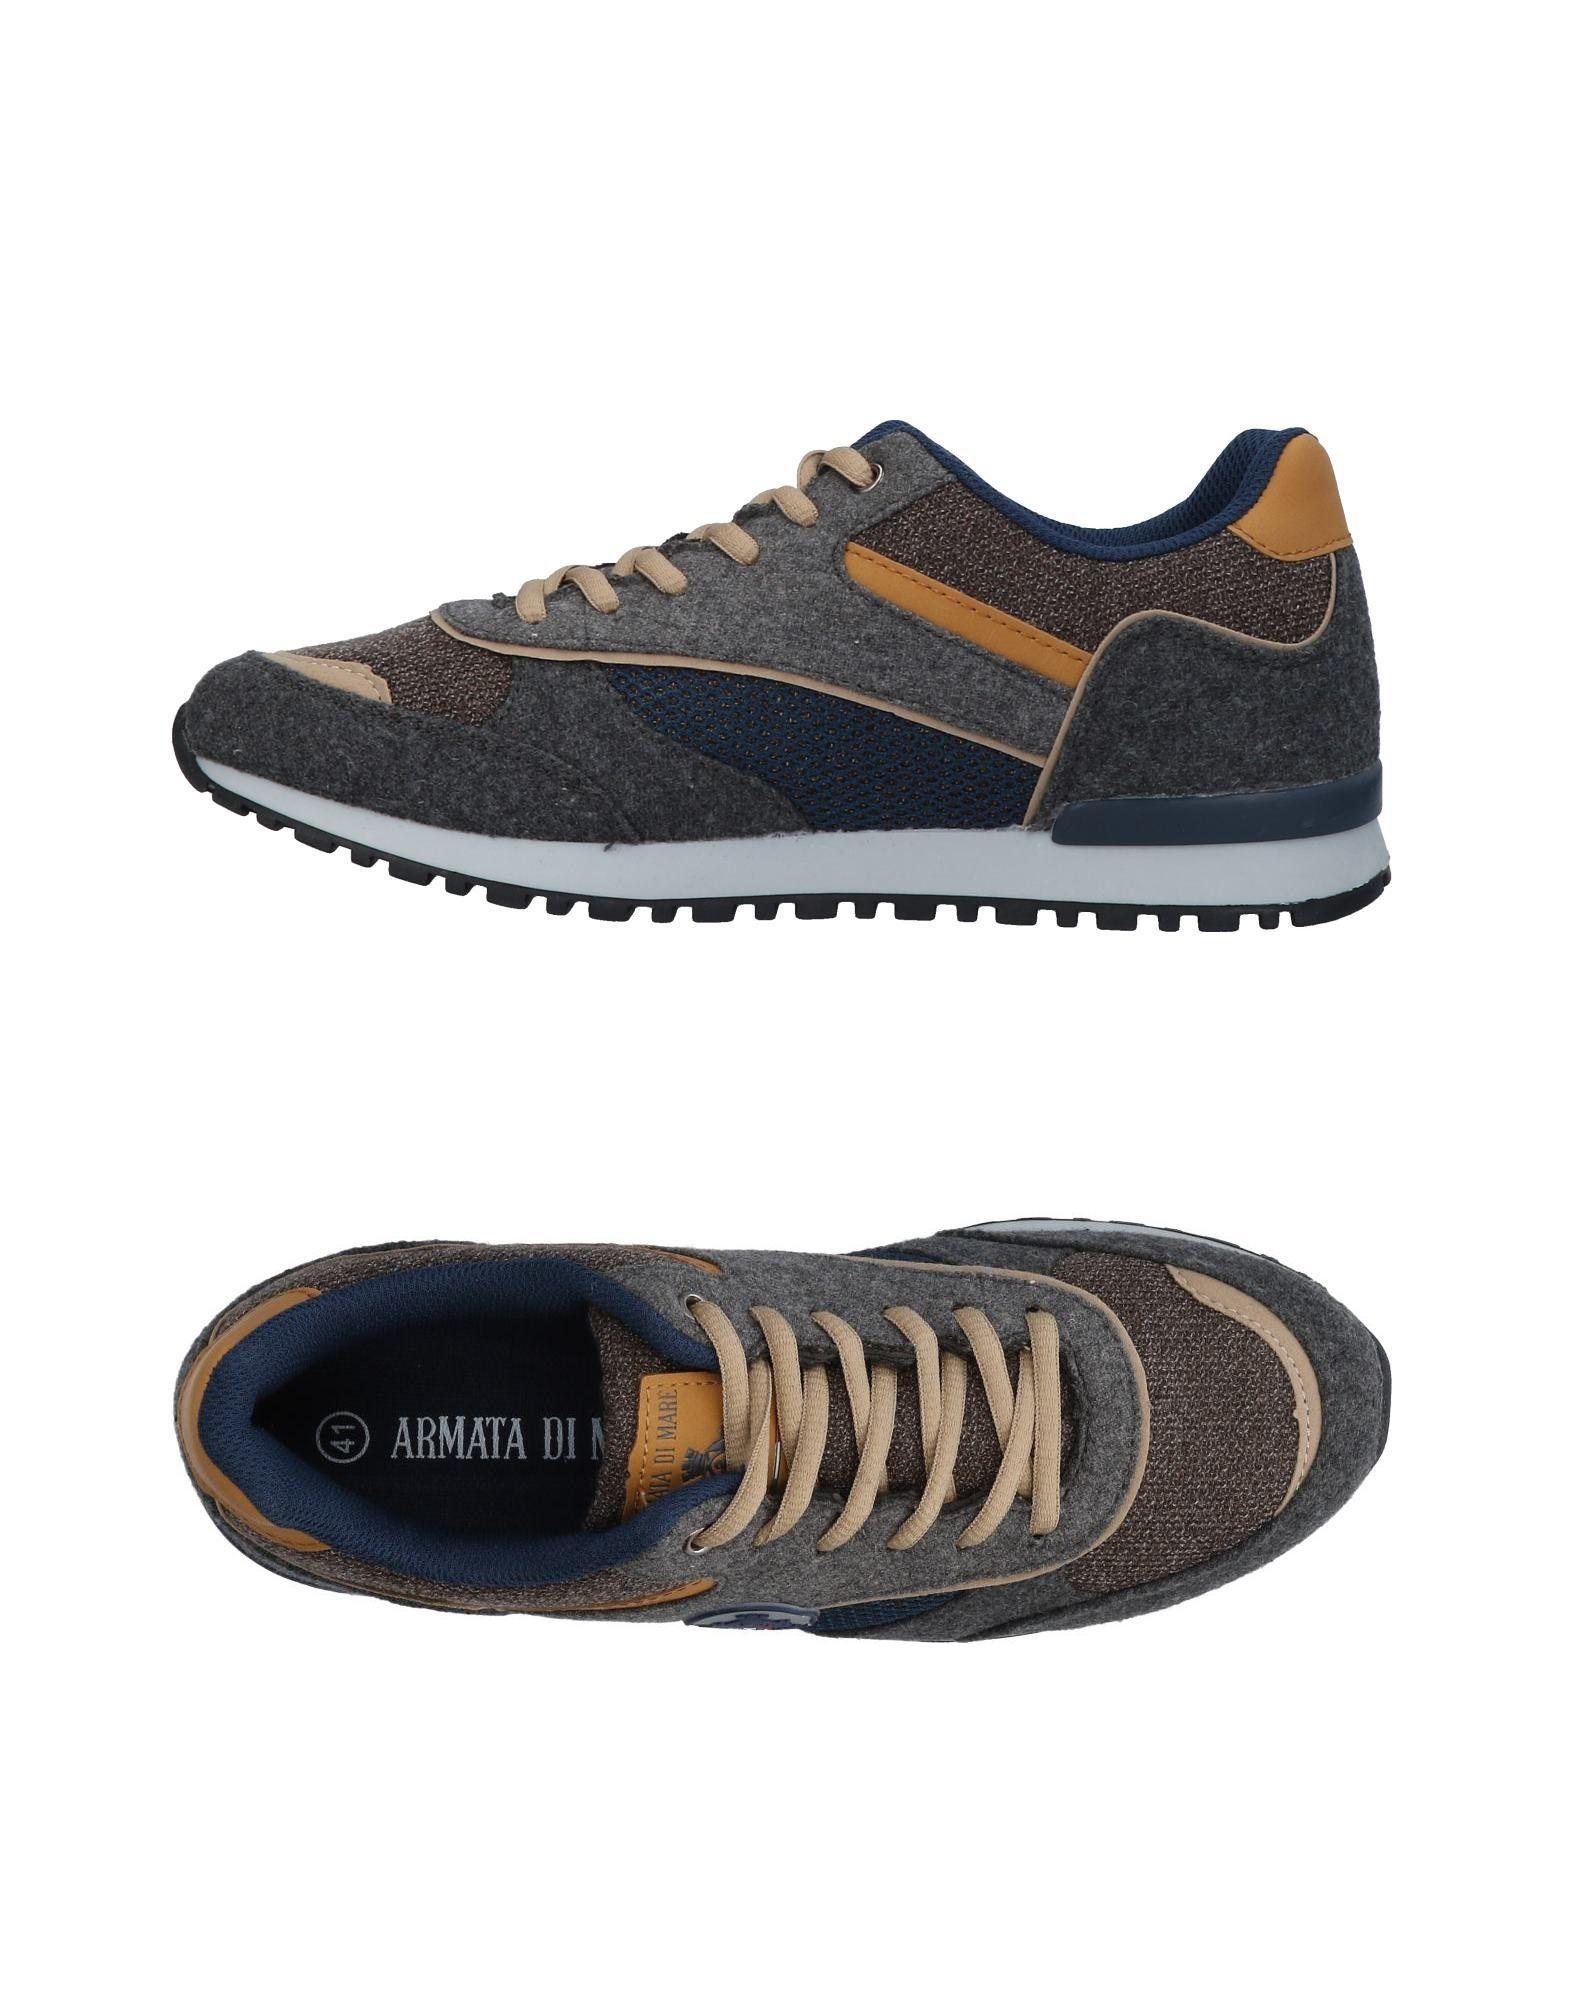 Armata Di Mare Bas-tops Et Chaussures De Sport ZCj2isW1yQ